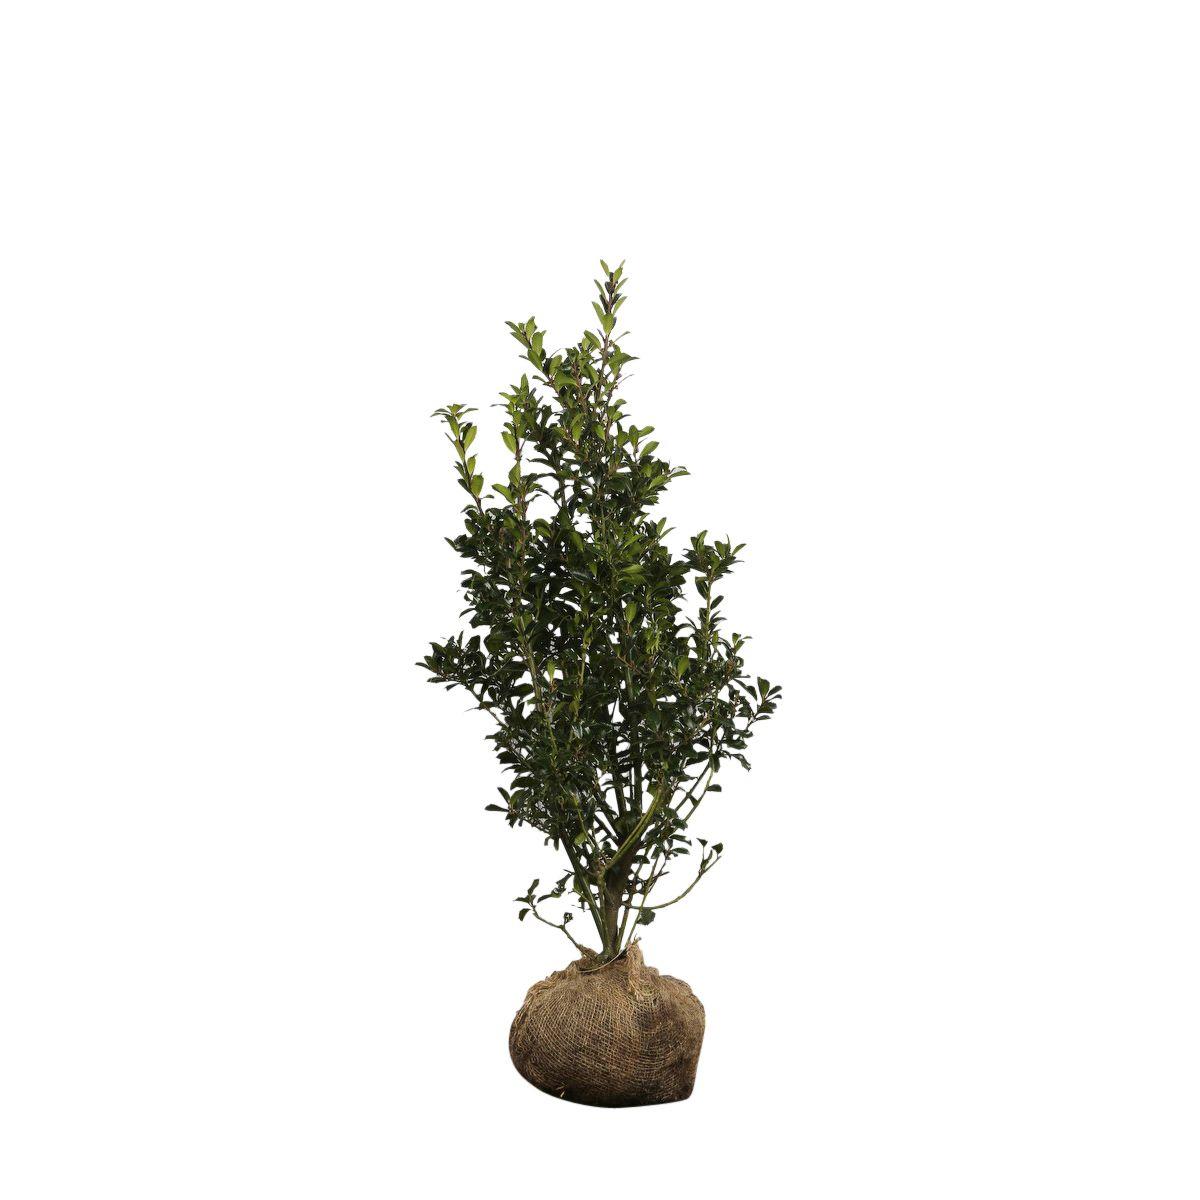 Stechpalme 'Heckenpracht'  Wurzelballen 80-100 cm